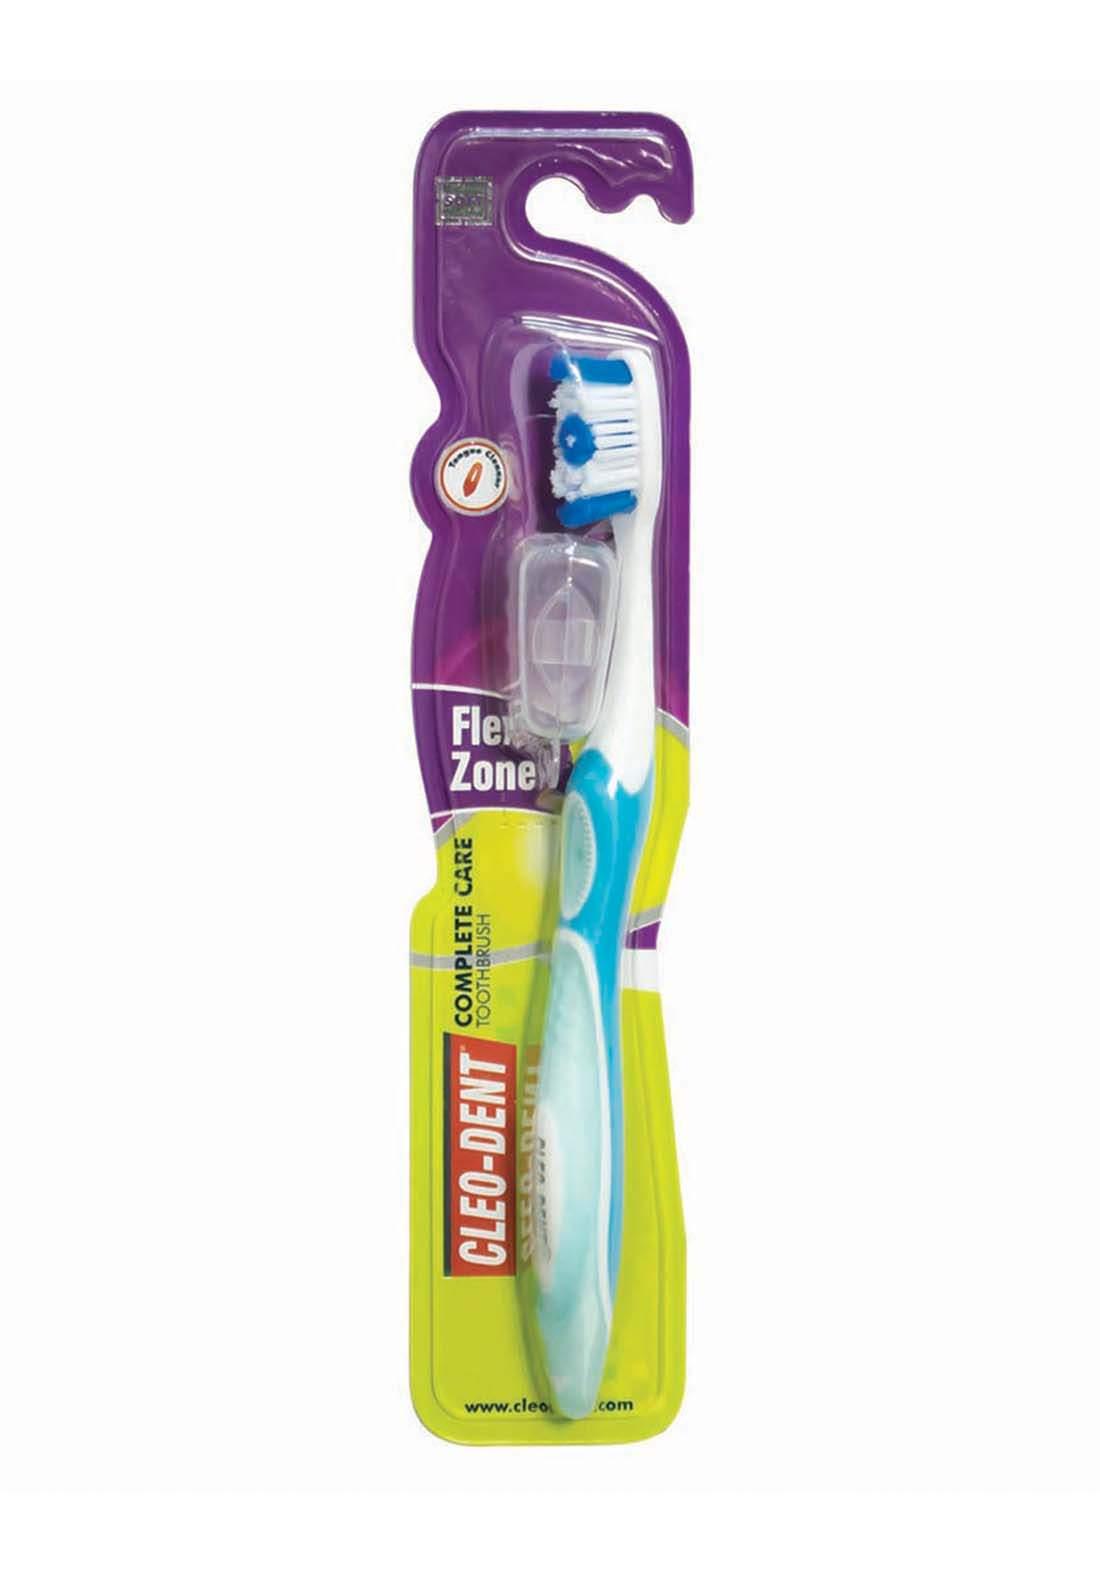 Cleo-Dent  Double Protection Tooth Brush  Medium فرشة اسنان  متوسطة